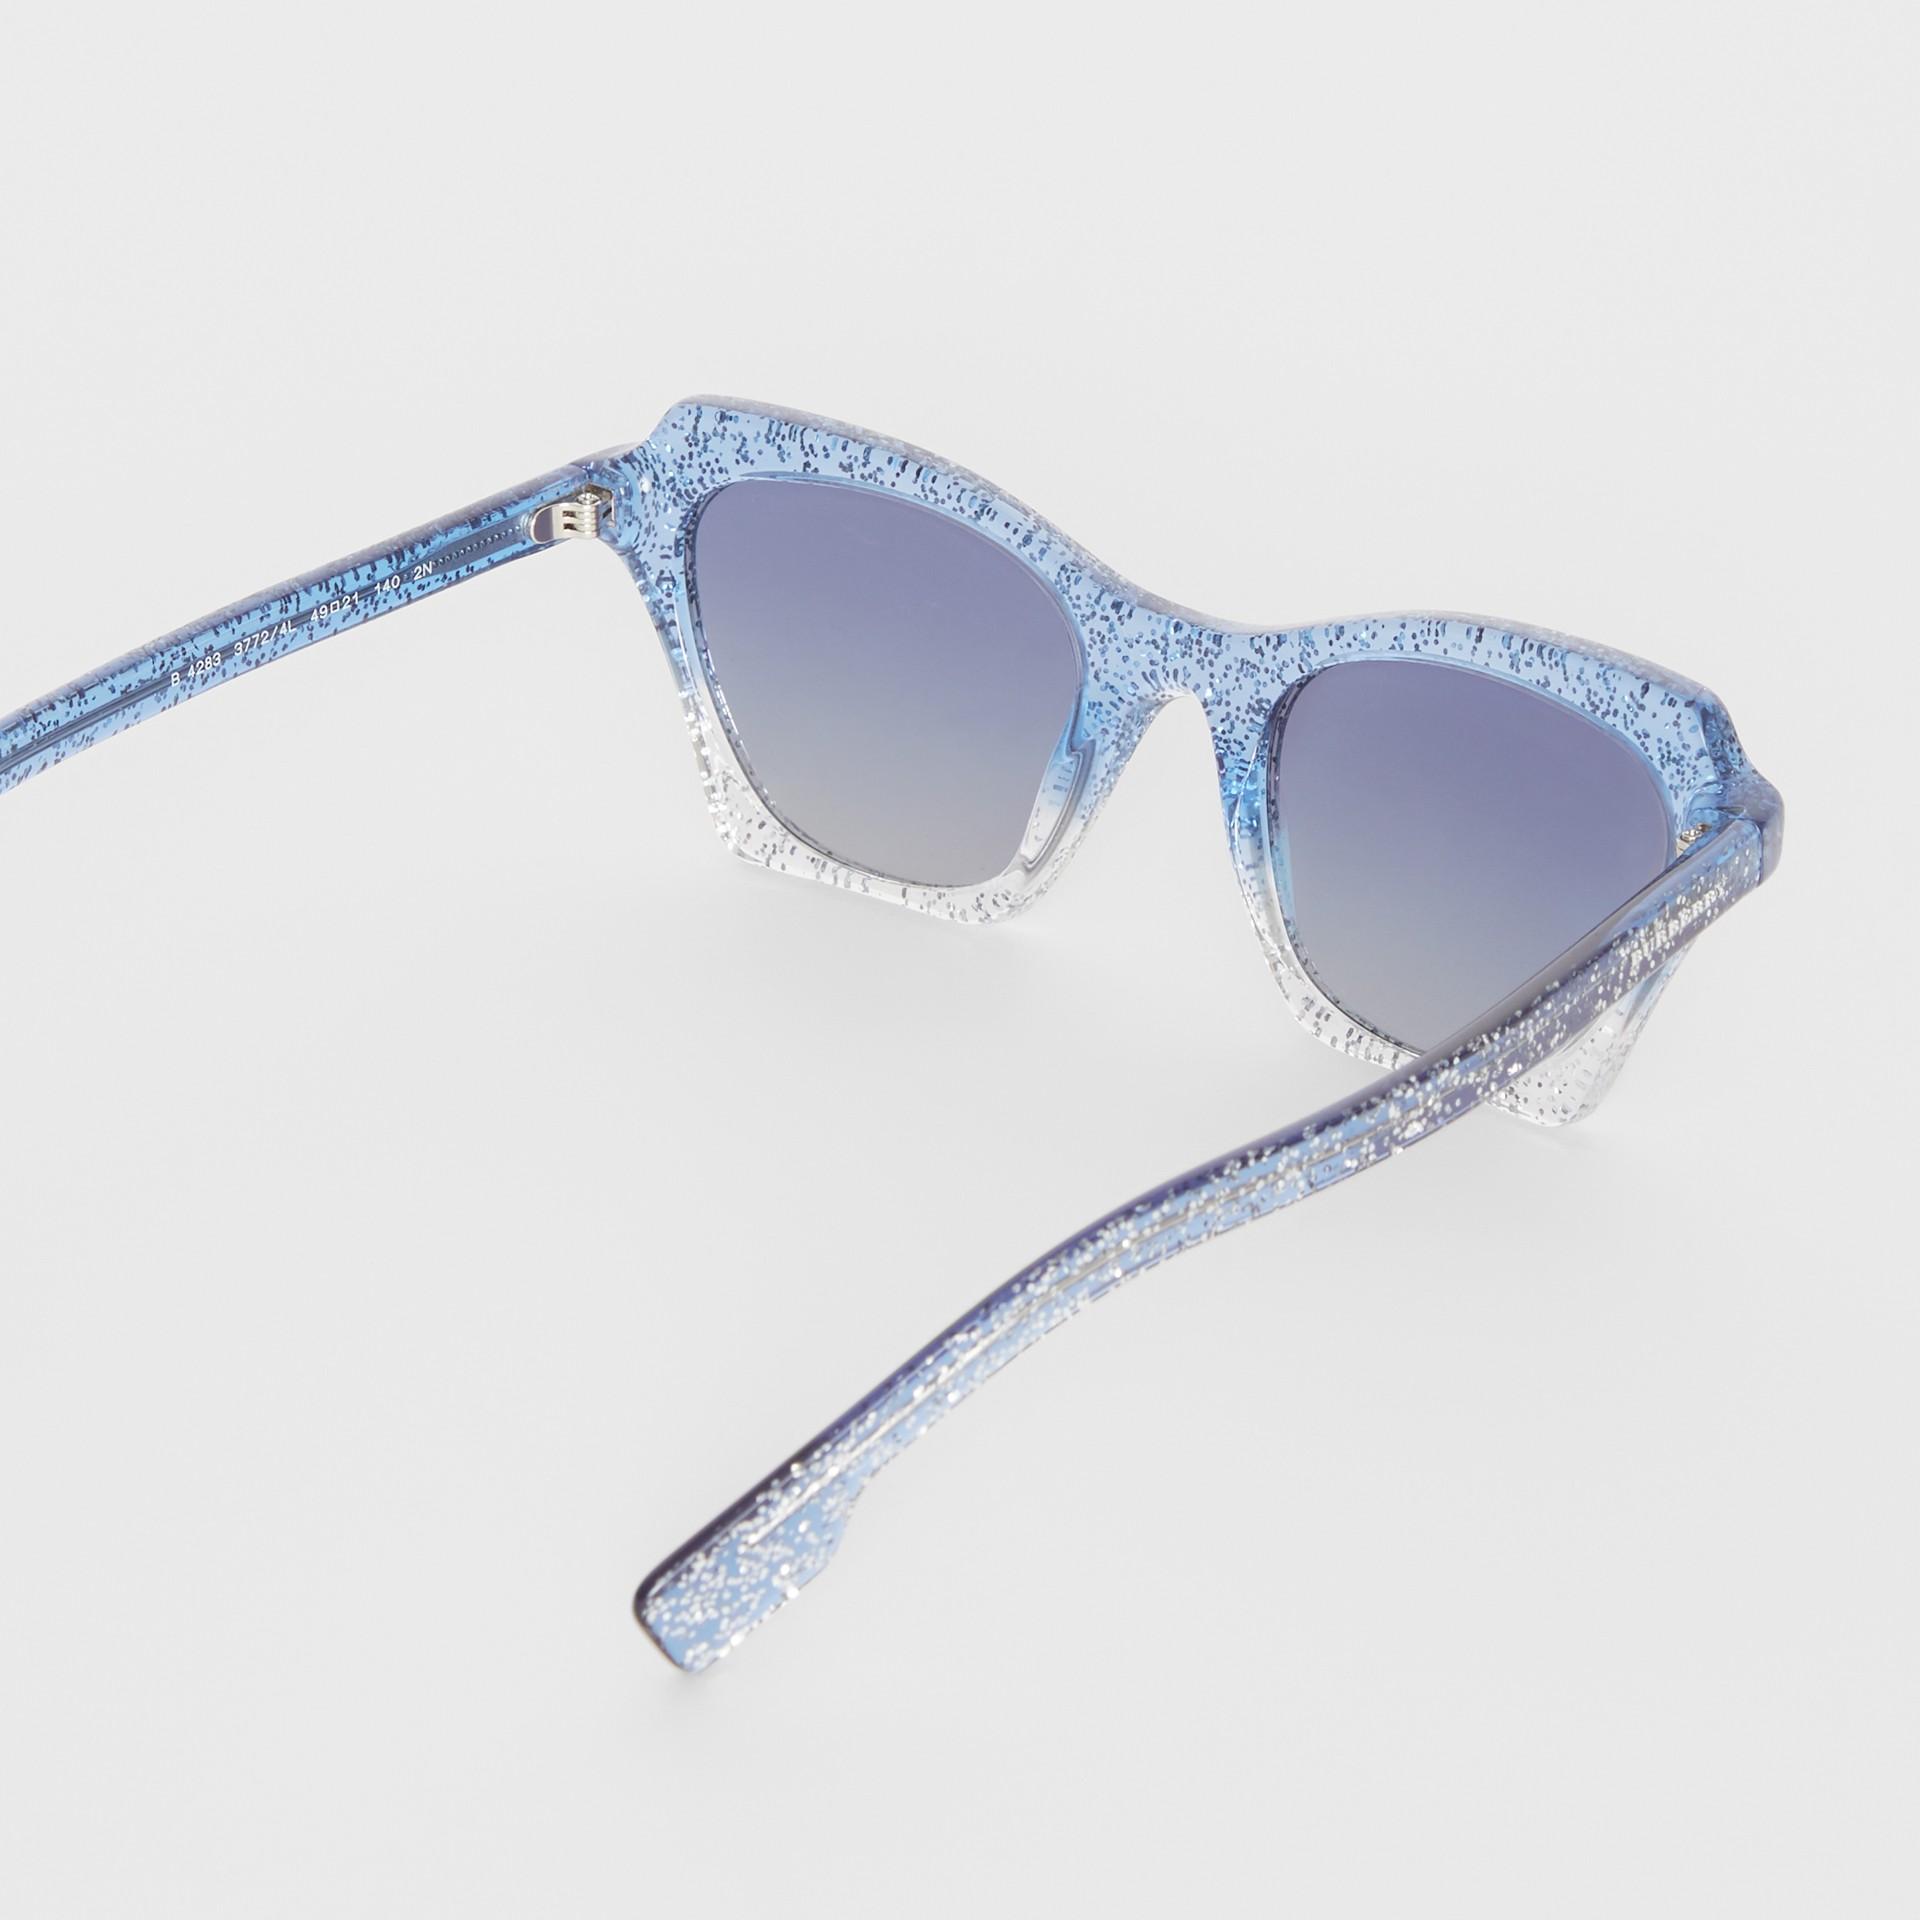 Butterfly Frame Sunglasses in Blue - Women | Burberry Australia - gallery image 3